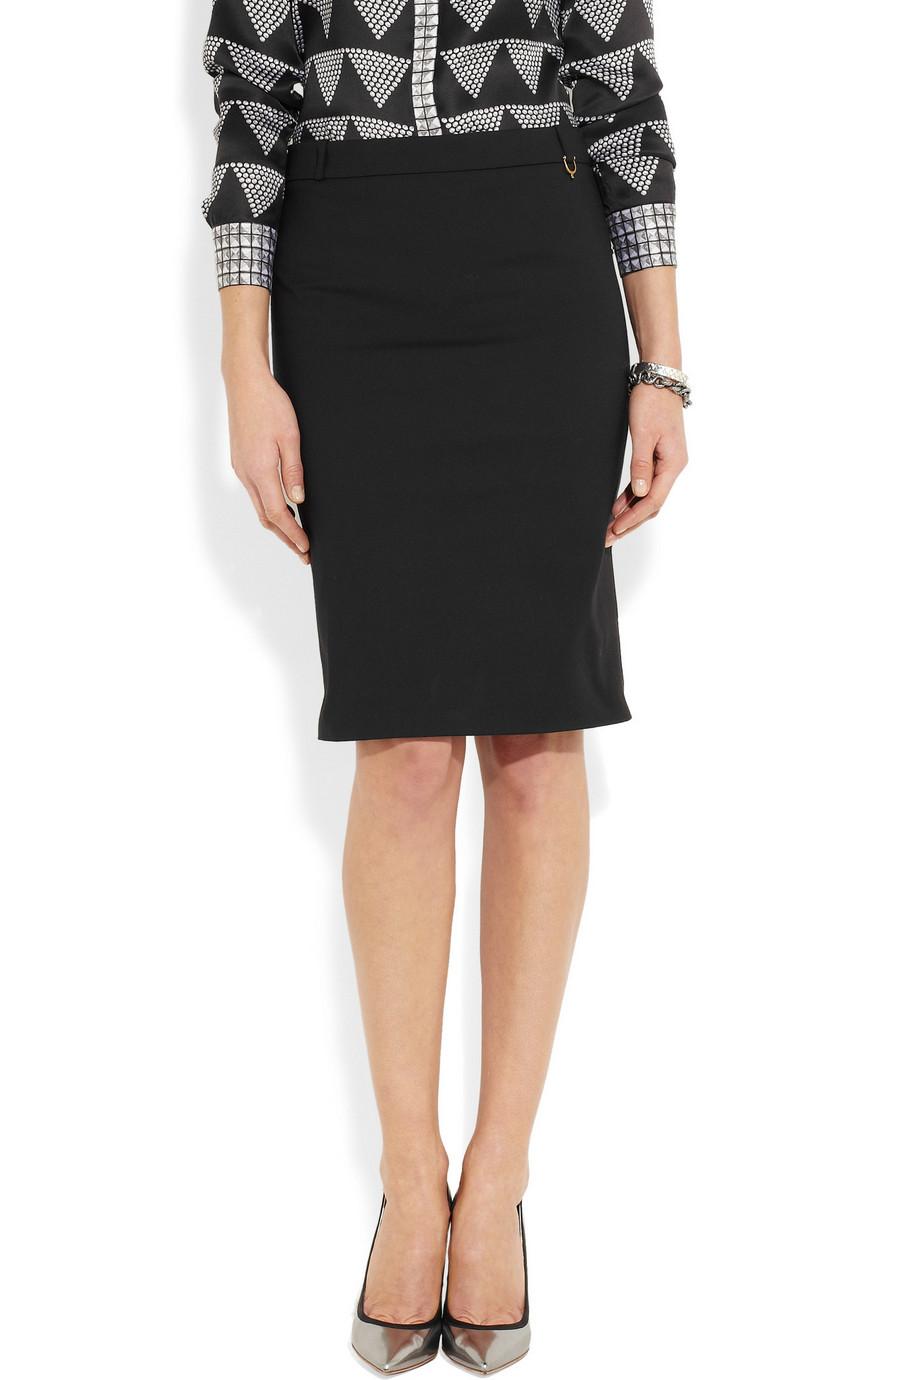 3fdd0c3613c Neoncoralcegfasecom — Интернет-магазин одежды короткие юбки